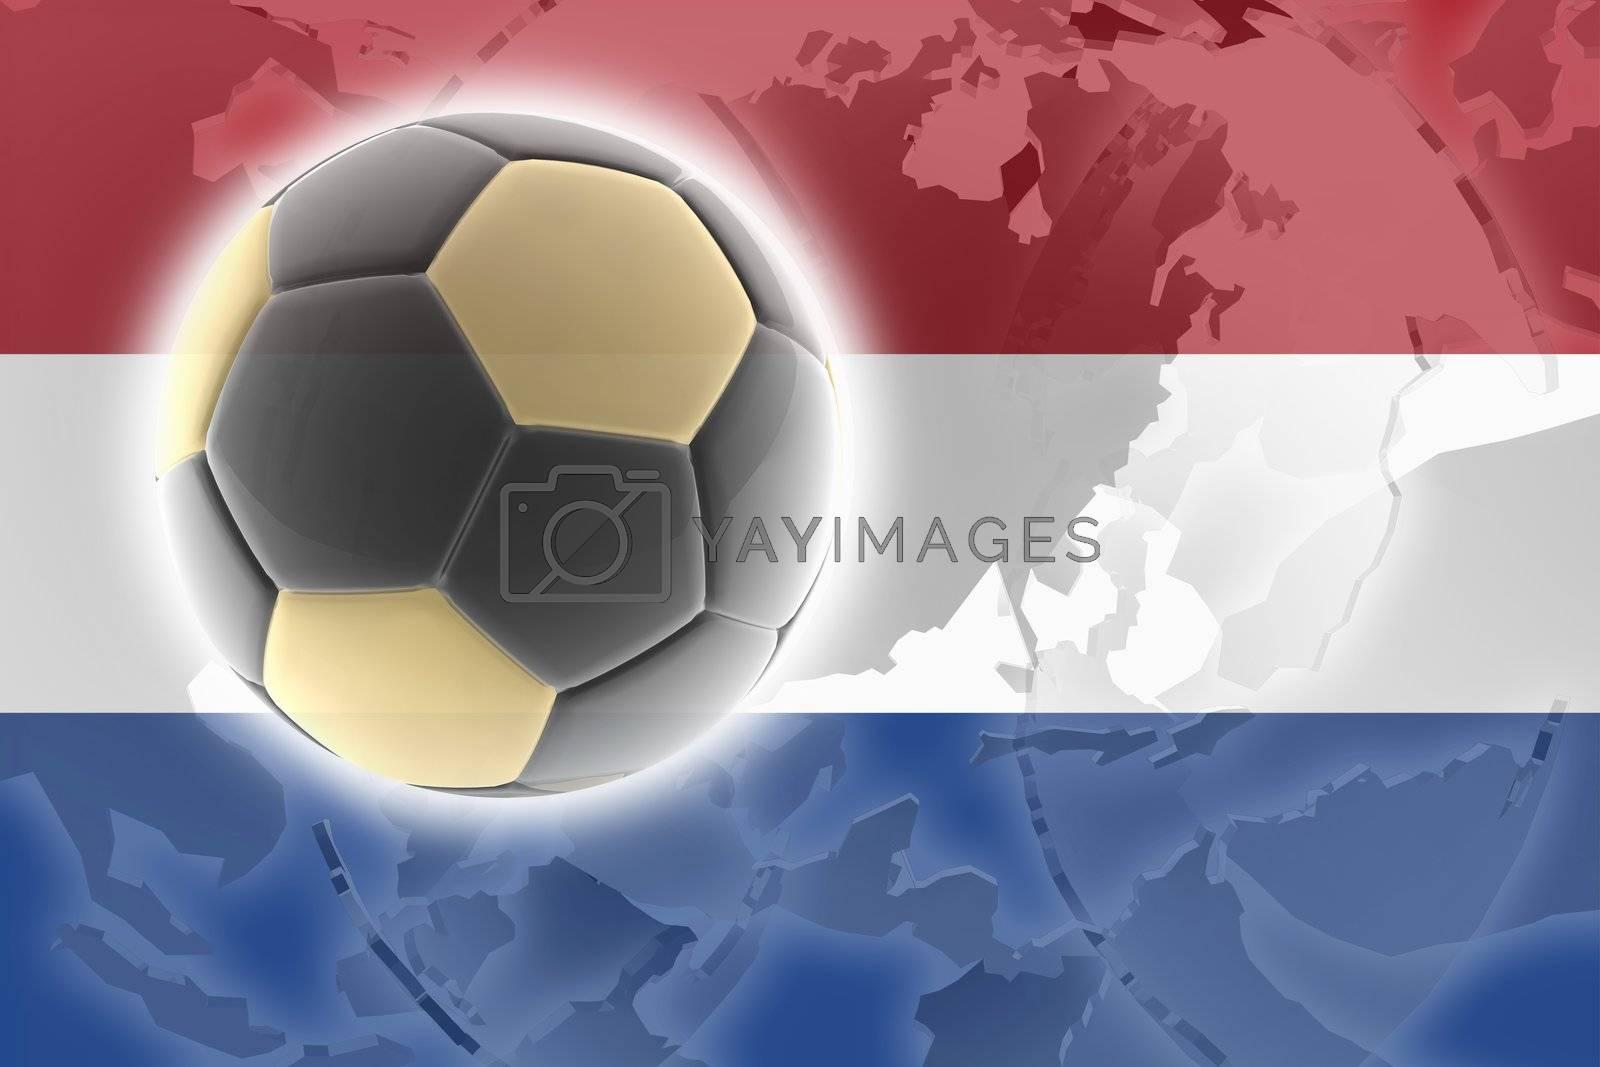 Flag of Netherlands, national country symbol illustration sports soccer football